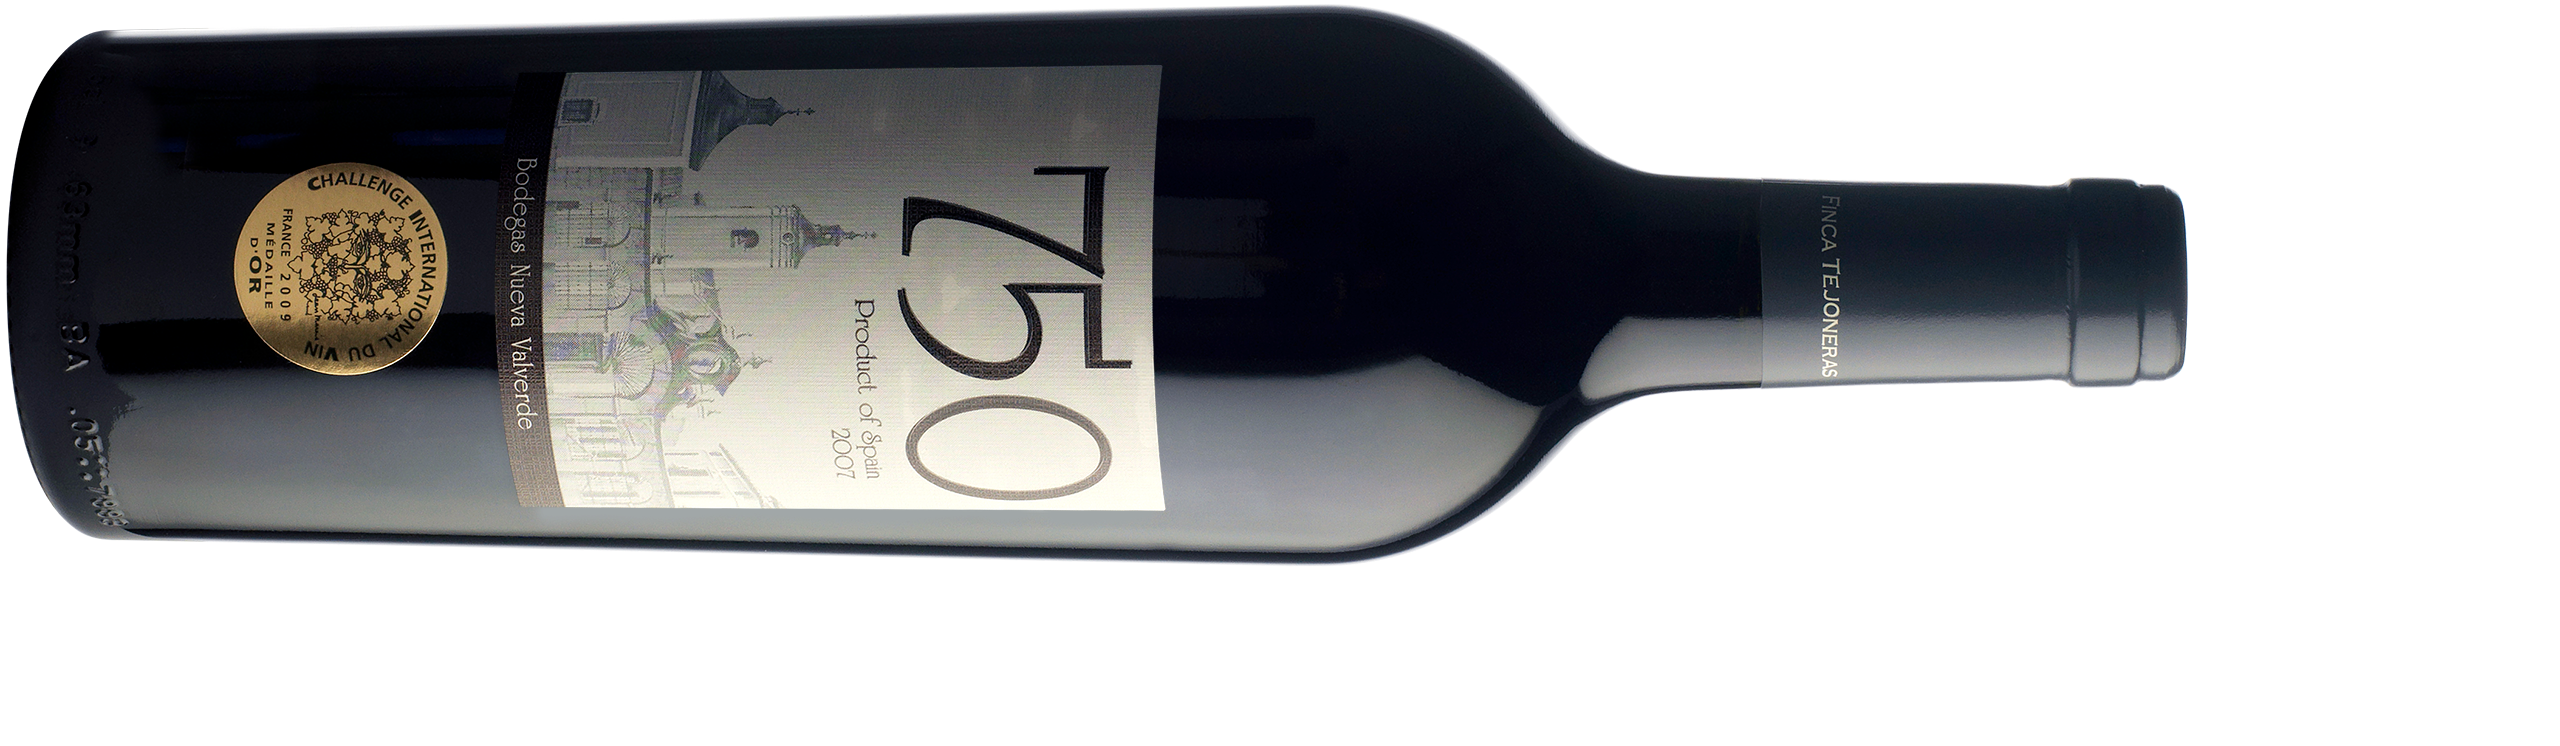 Bottle of 750 in horizontal position